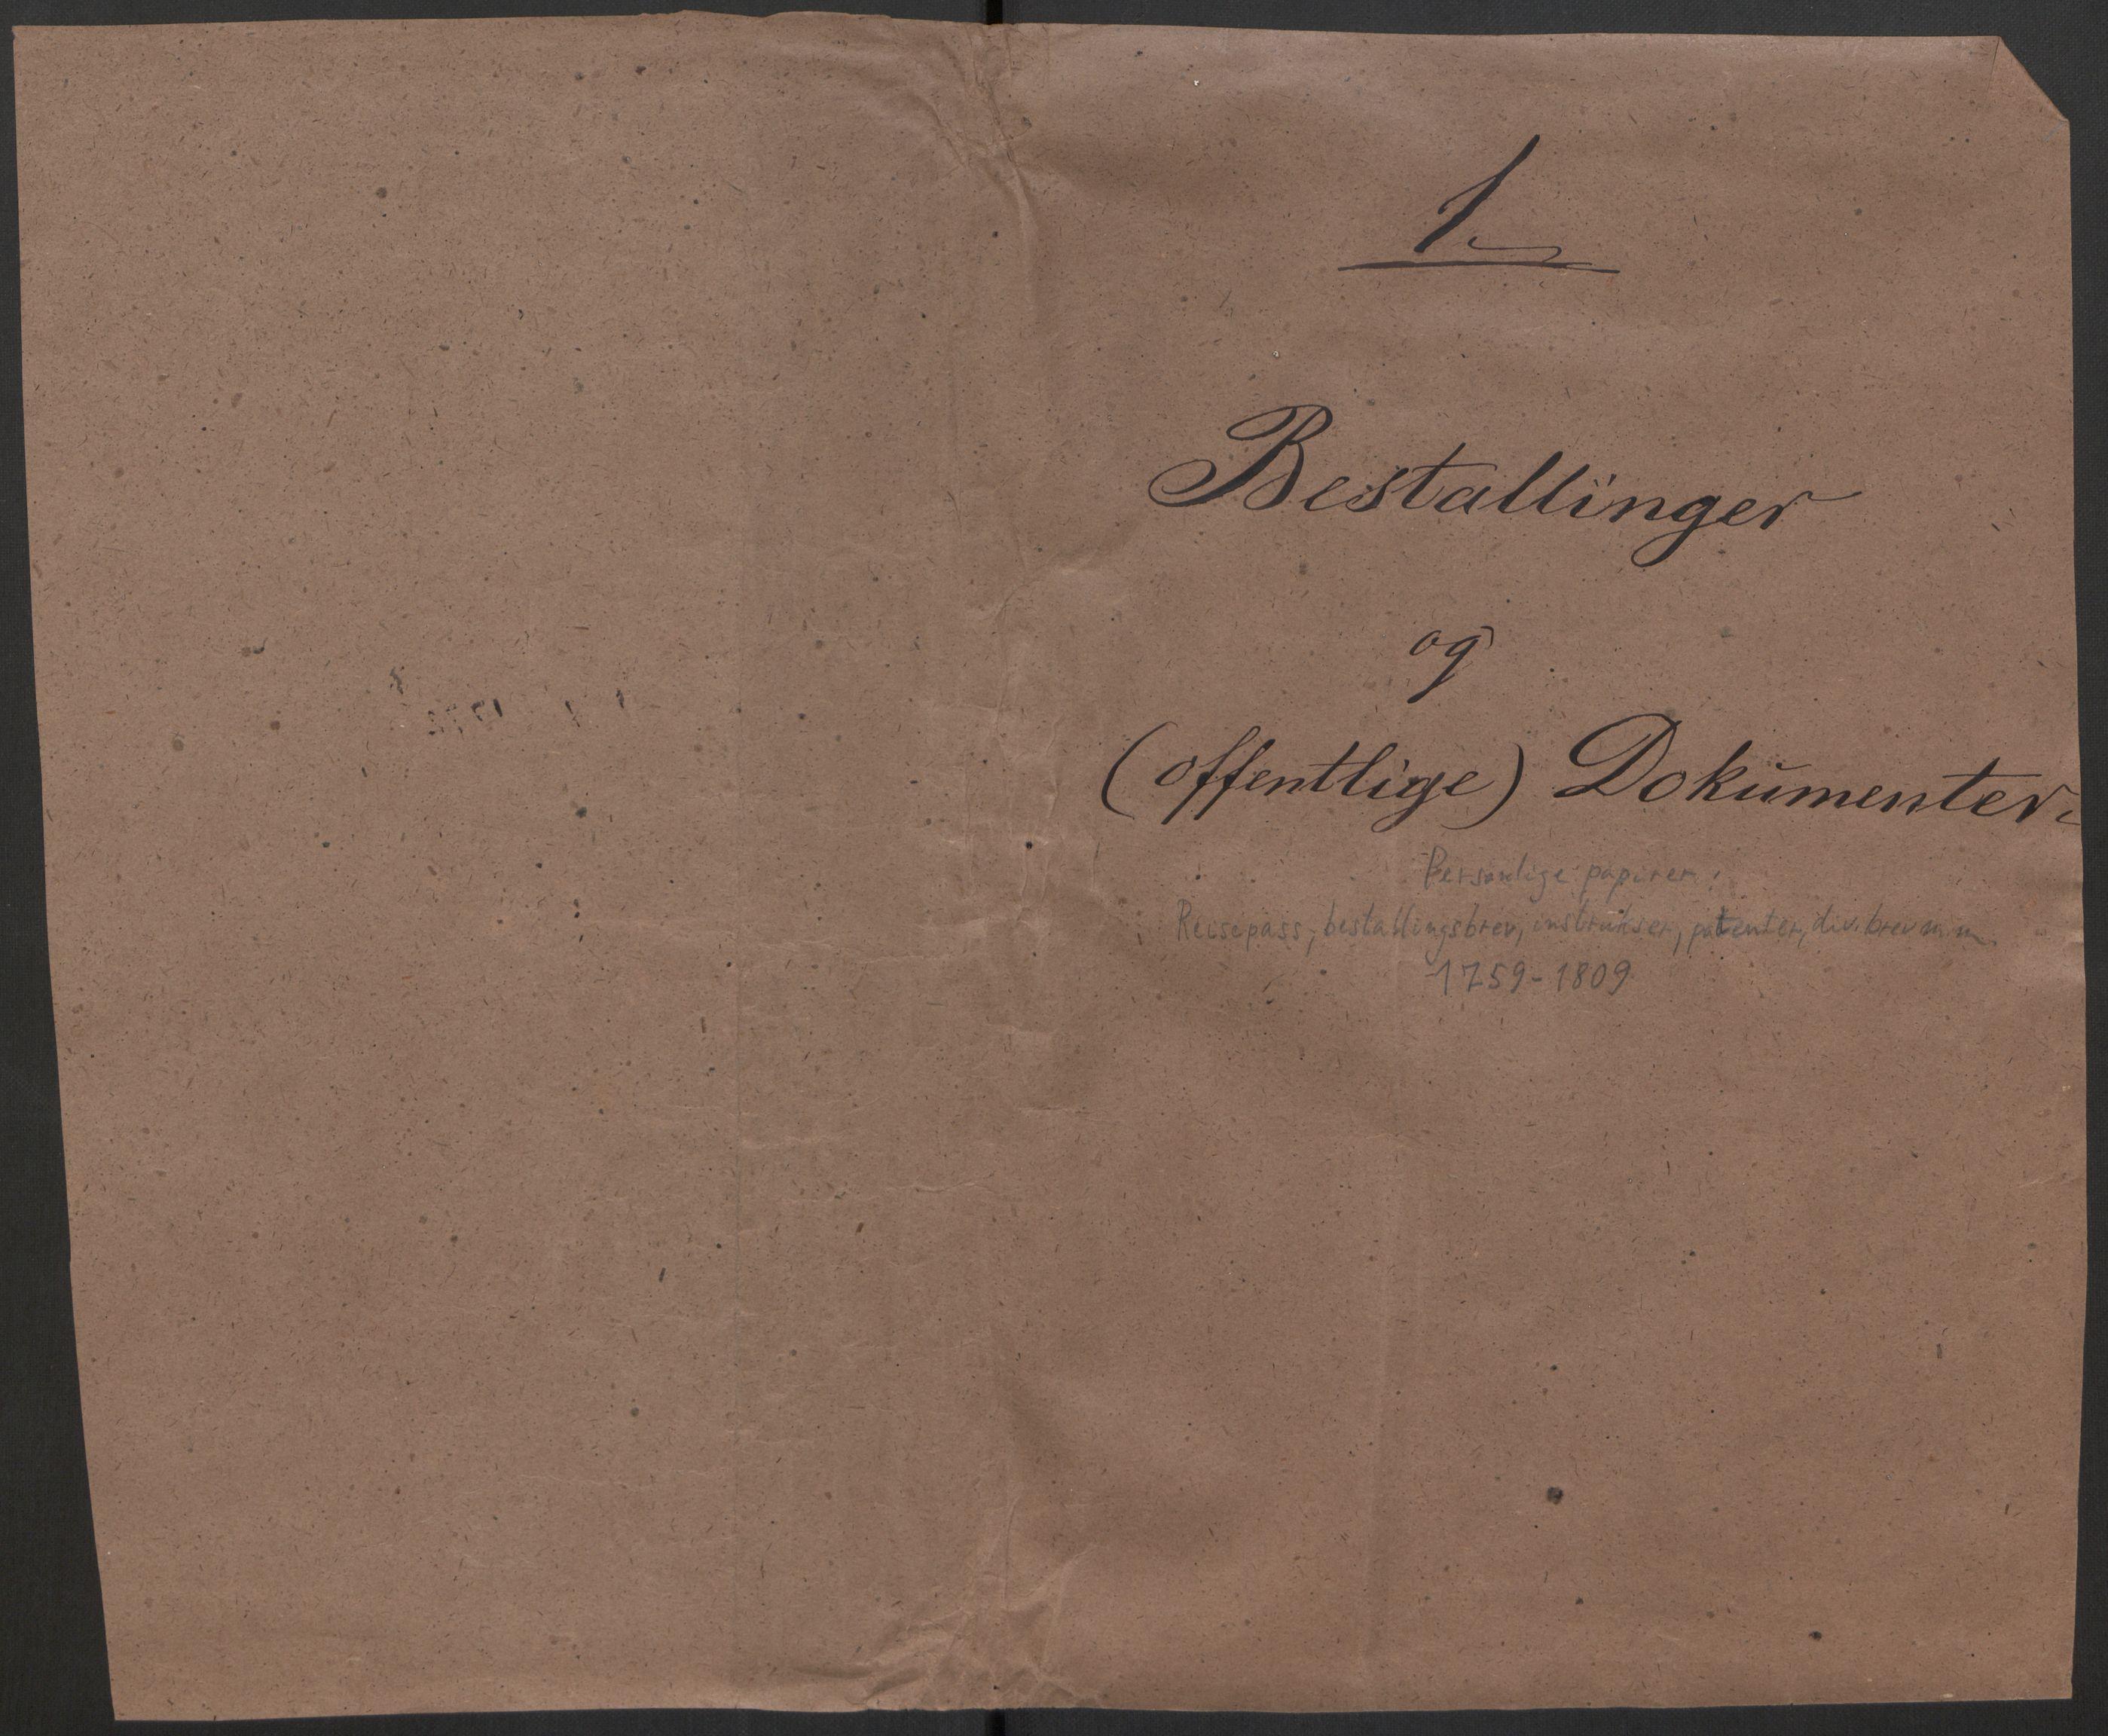 RA, Hesselberg, Hans Jacob Henning, F/L0001: --, 1759-1809, p. 1